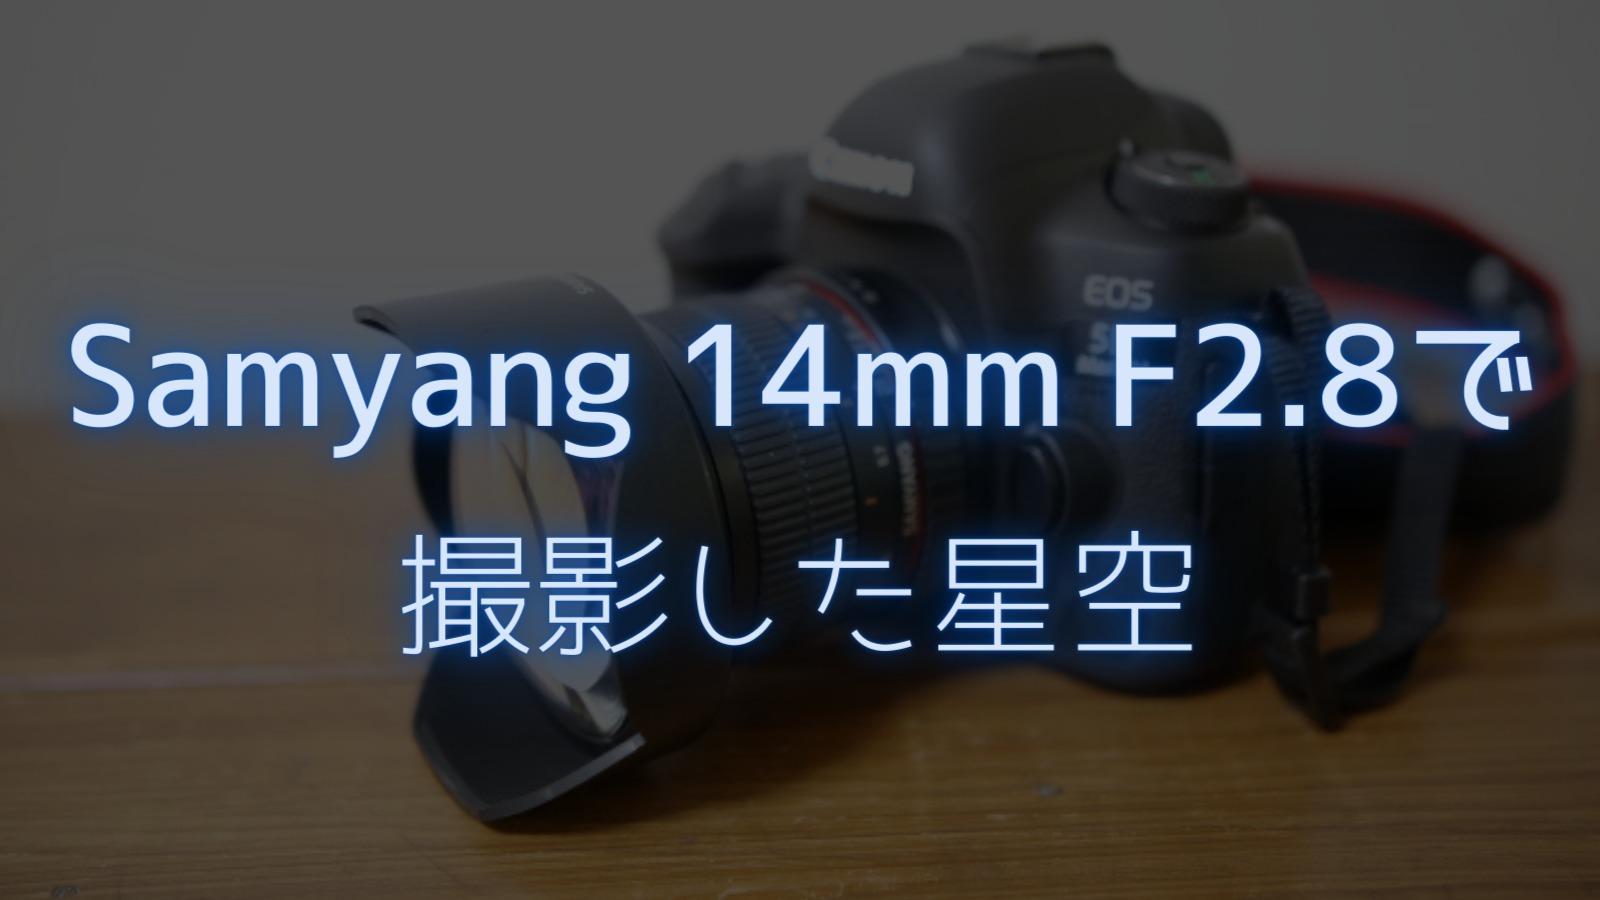 SAMYANG 14mm F2.8で撮影した星空の写真【レビュー】